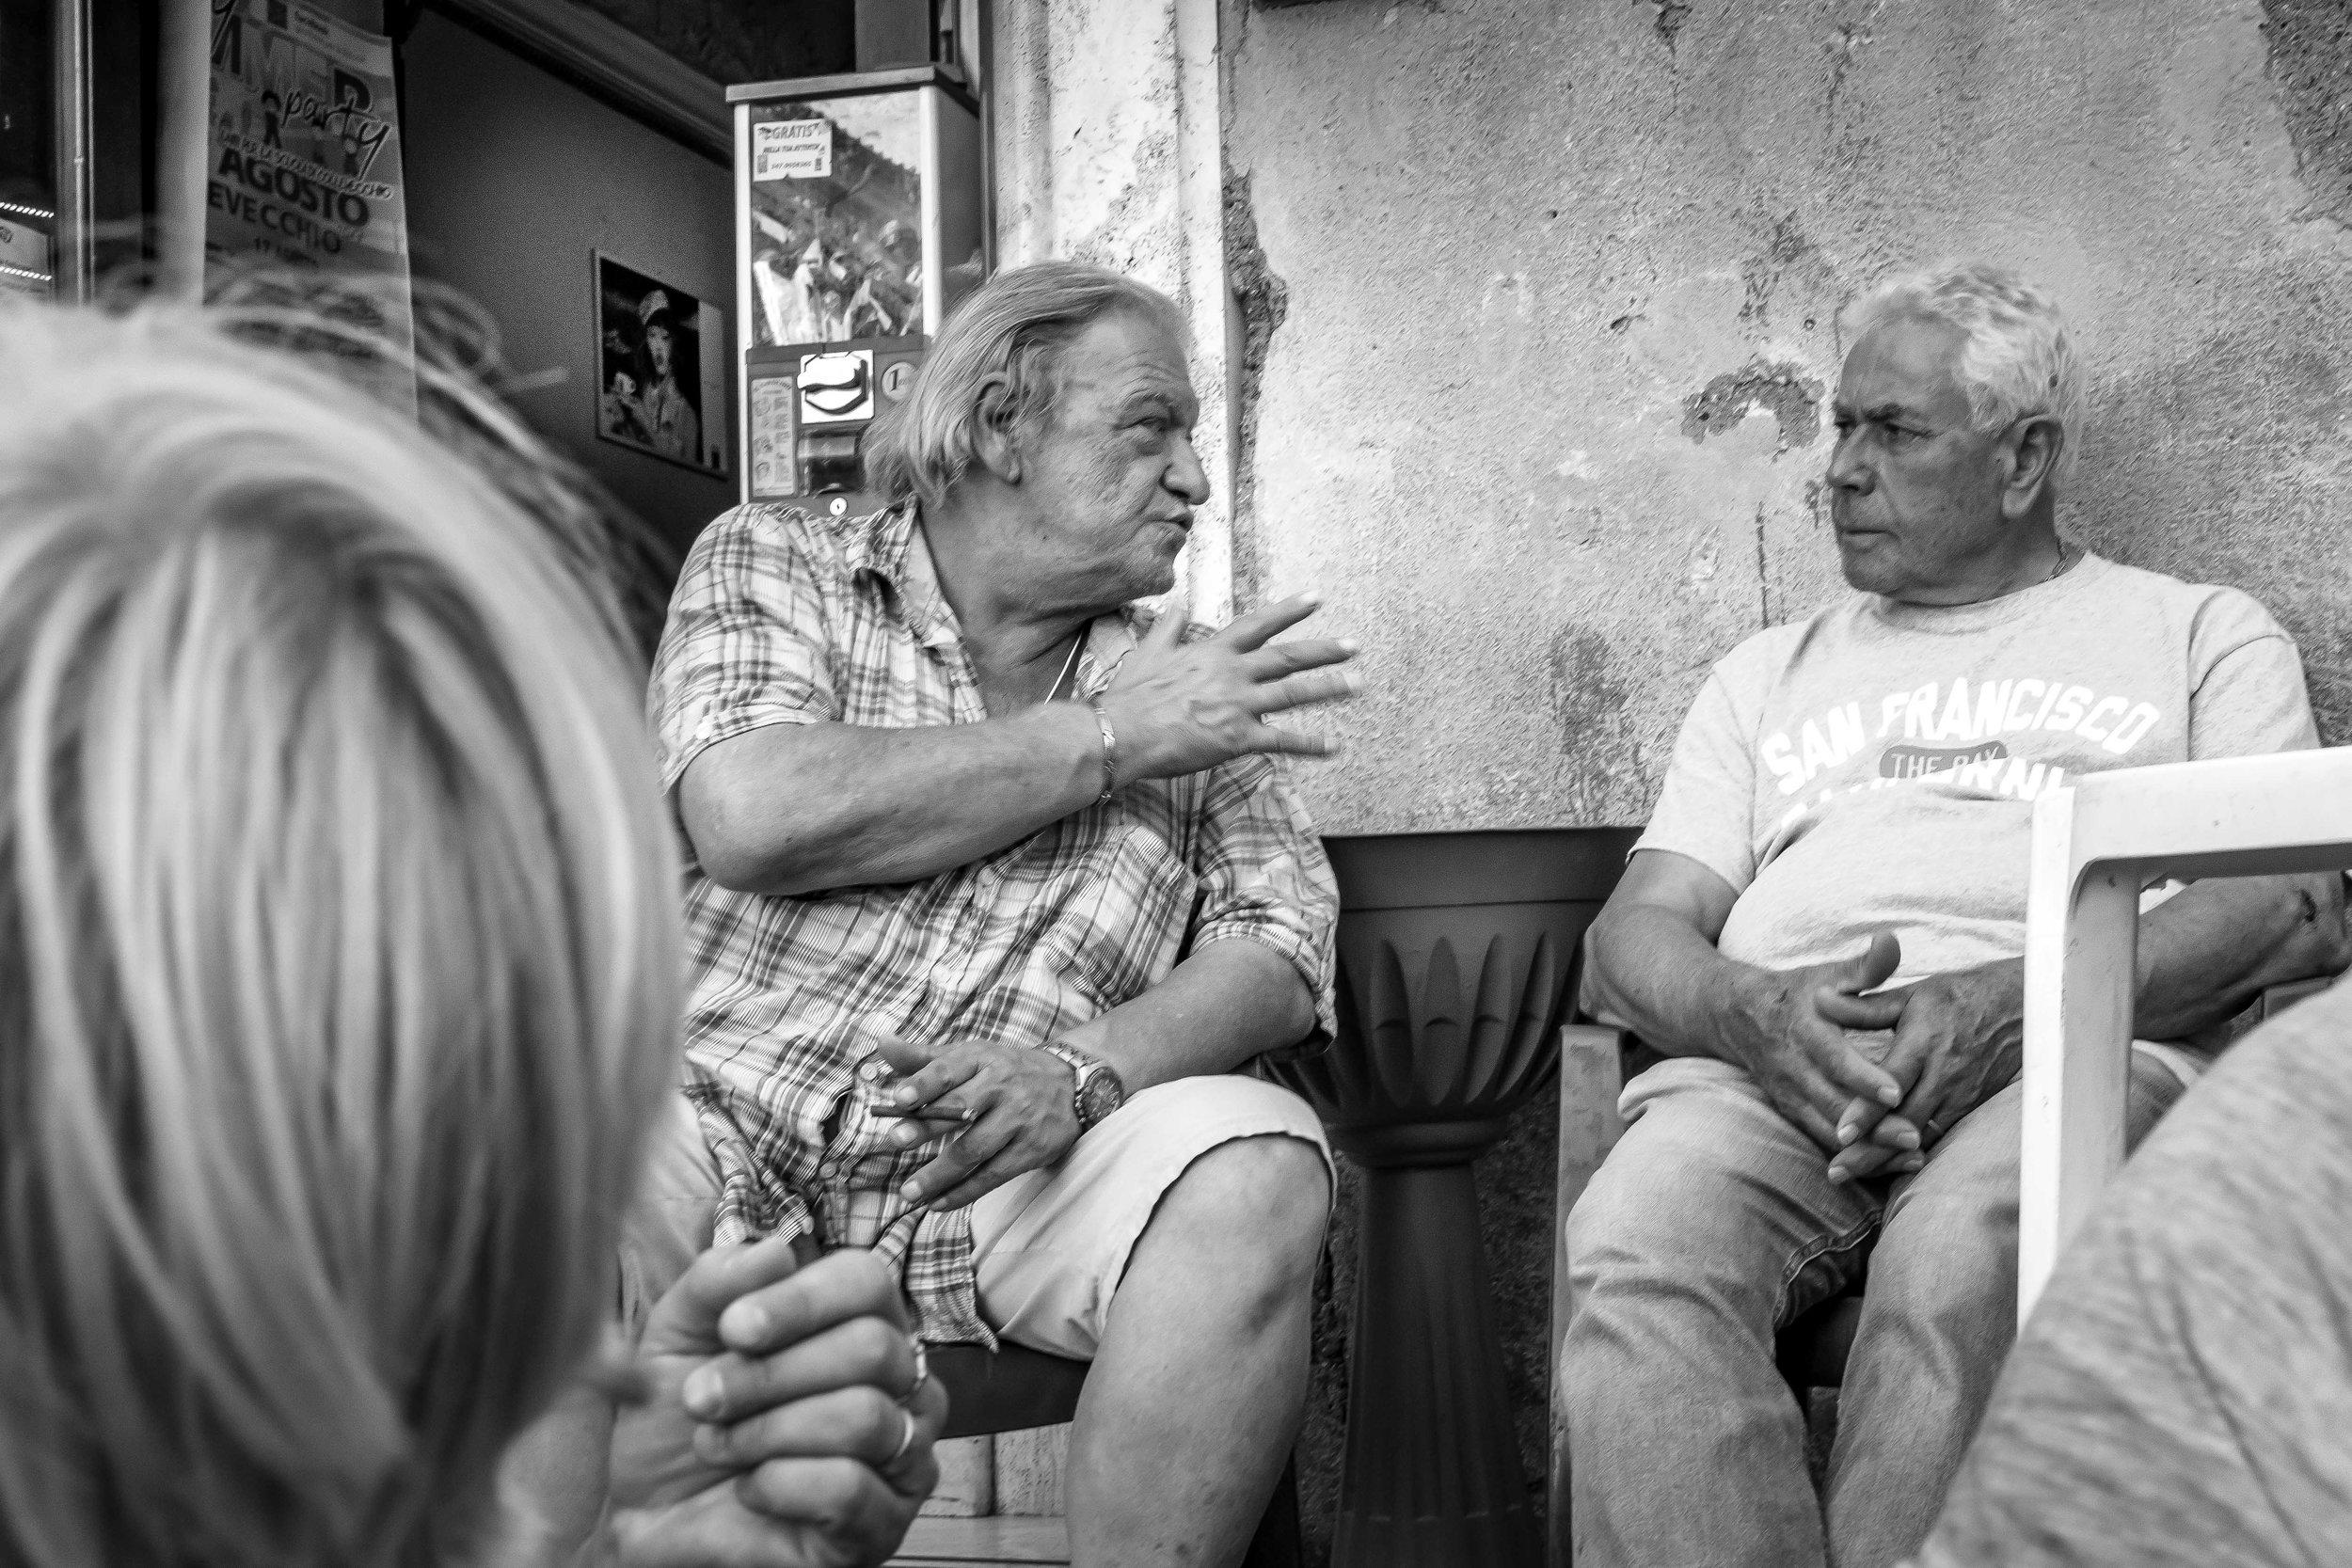 viewfinder-straatfotografie-oude-mannen-in-Collevecchio-8.jpg